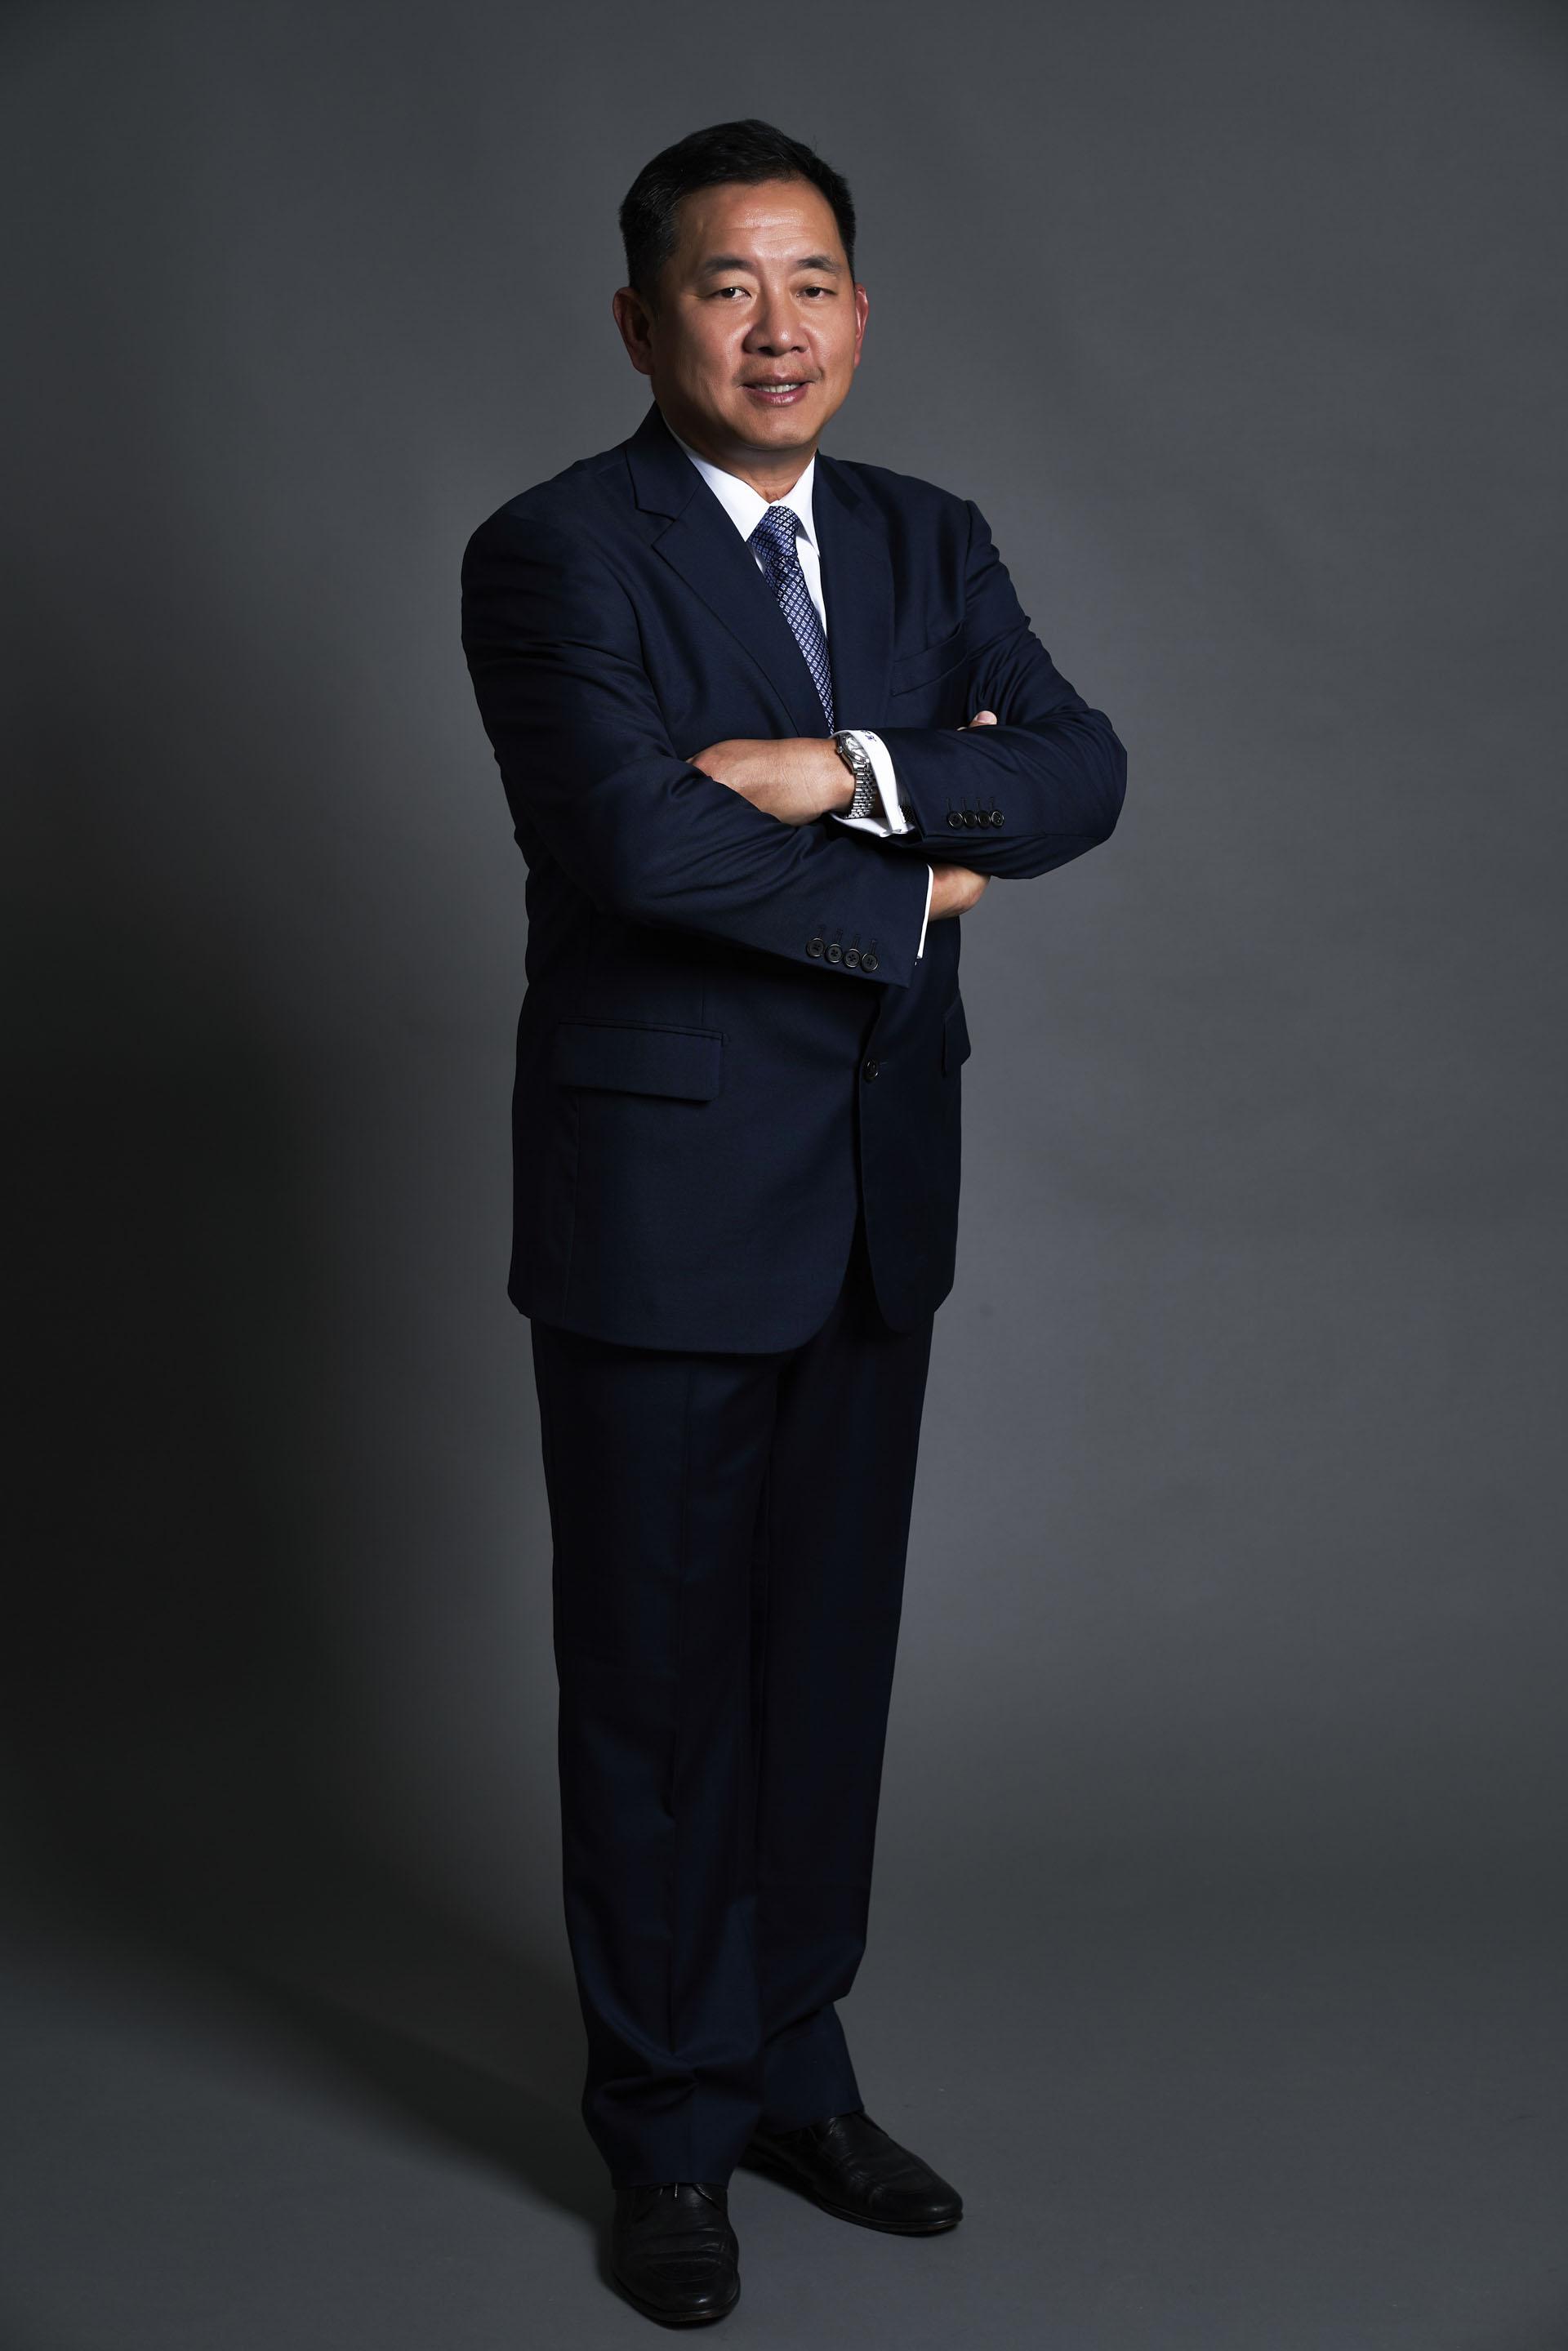 Corporate-Portrait-Photography-Singapore-Johna-88